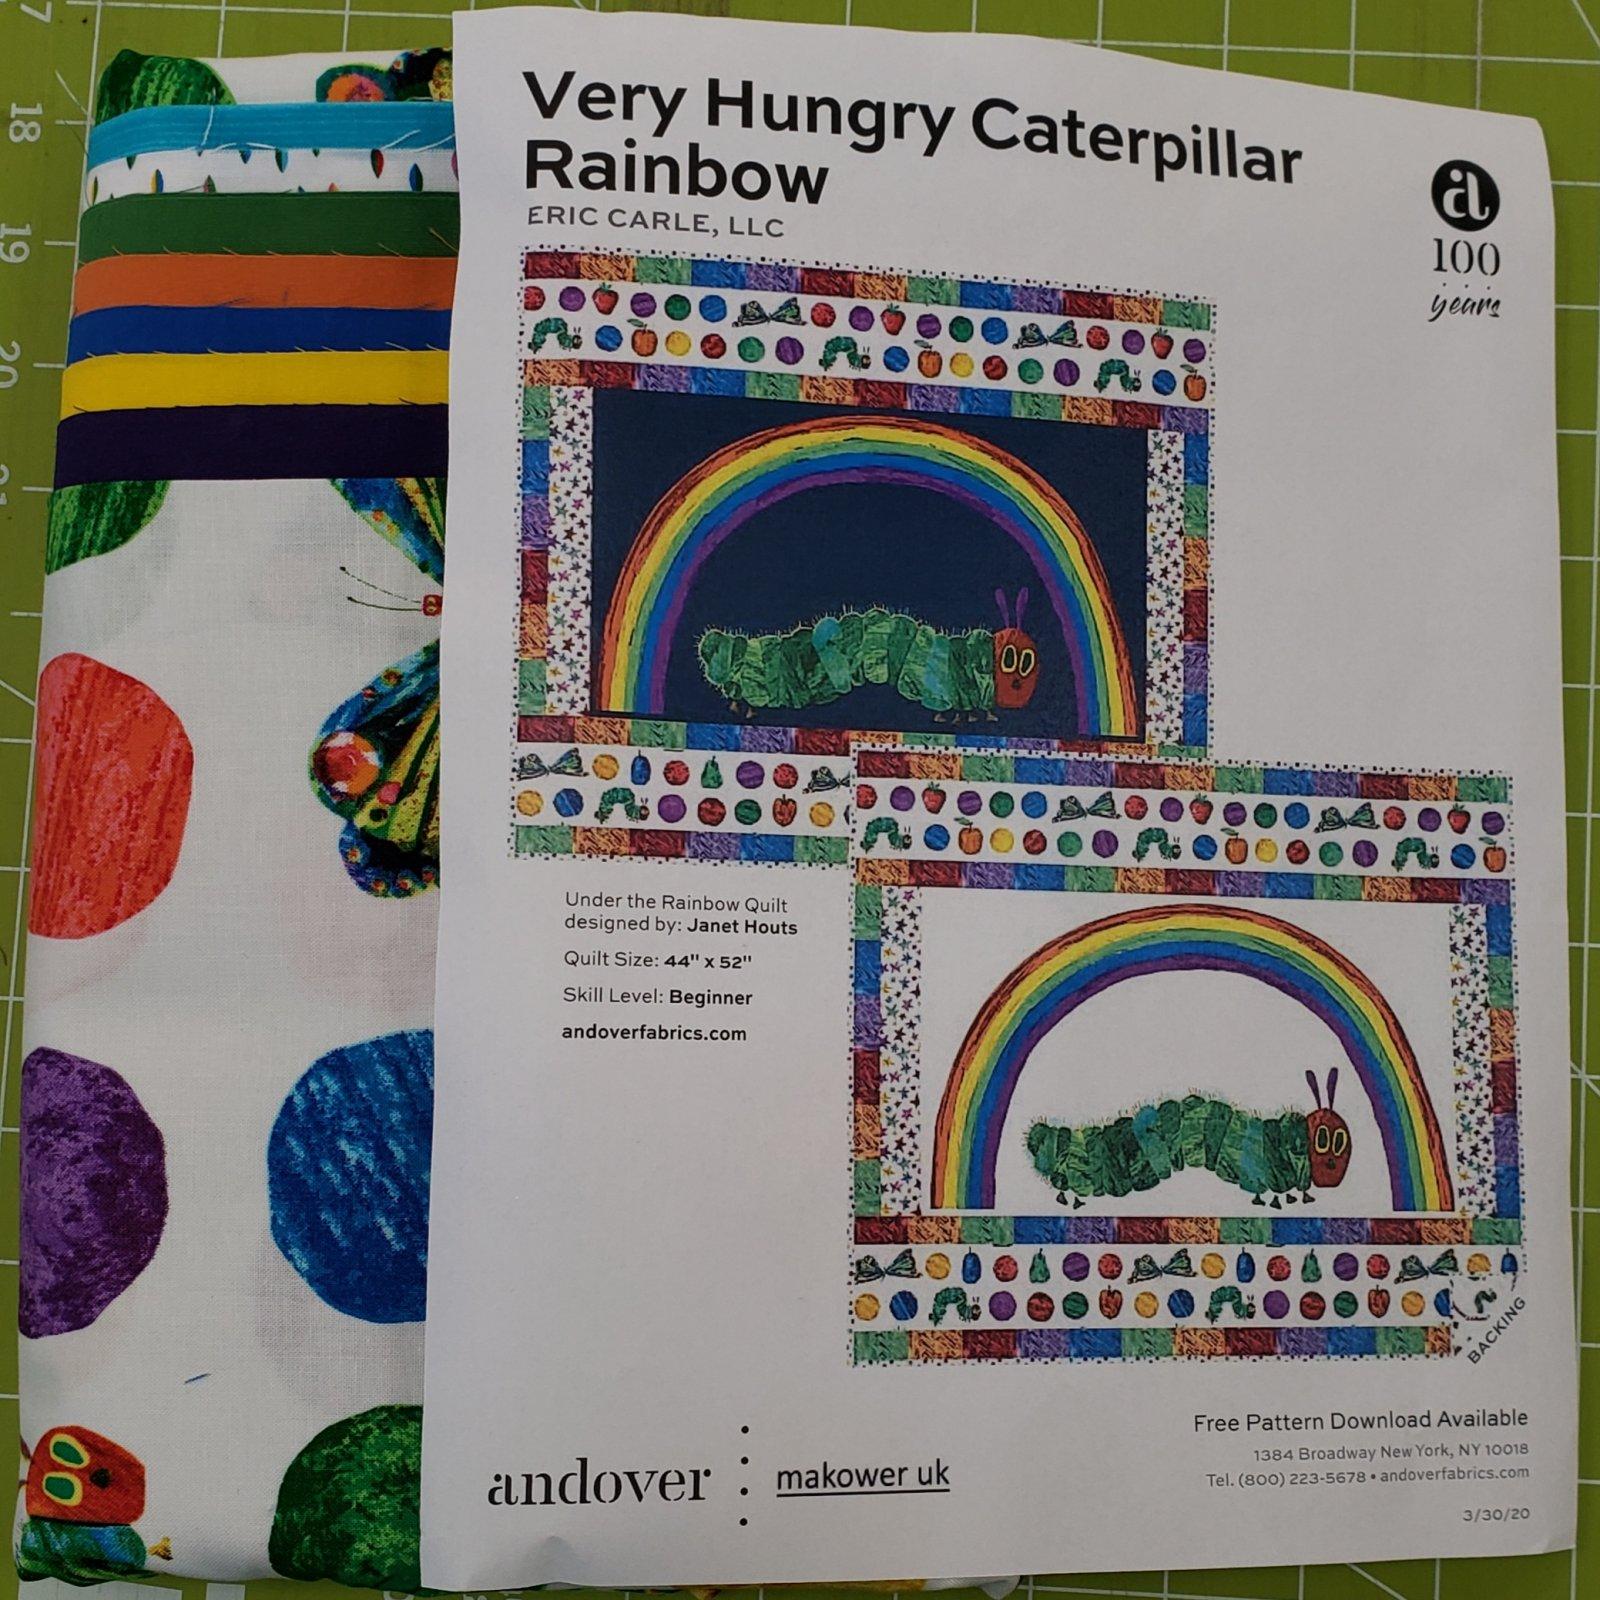 Andover Very Hungry Caterpillar Rainbow Kit